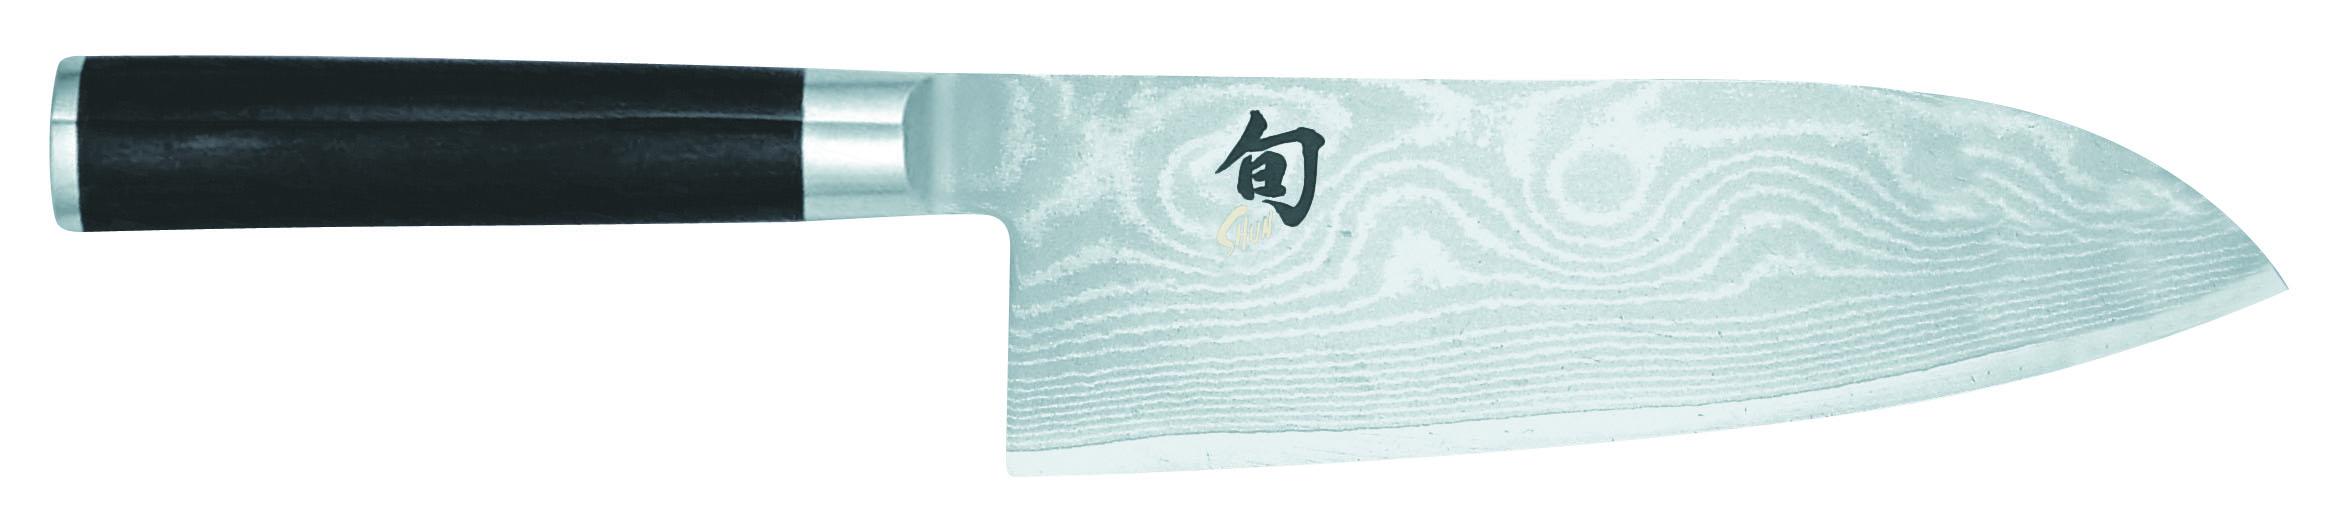 Kai Shun Classic DM-0717 Bred Santokukniv 19 cm